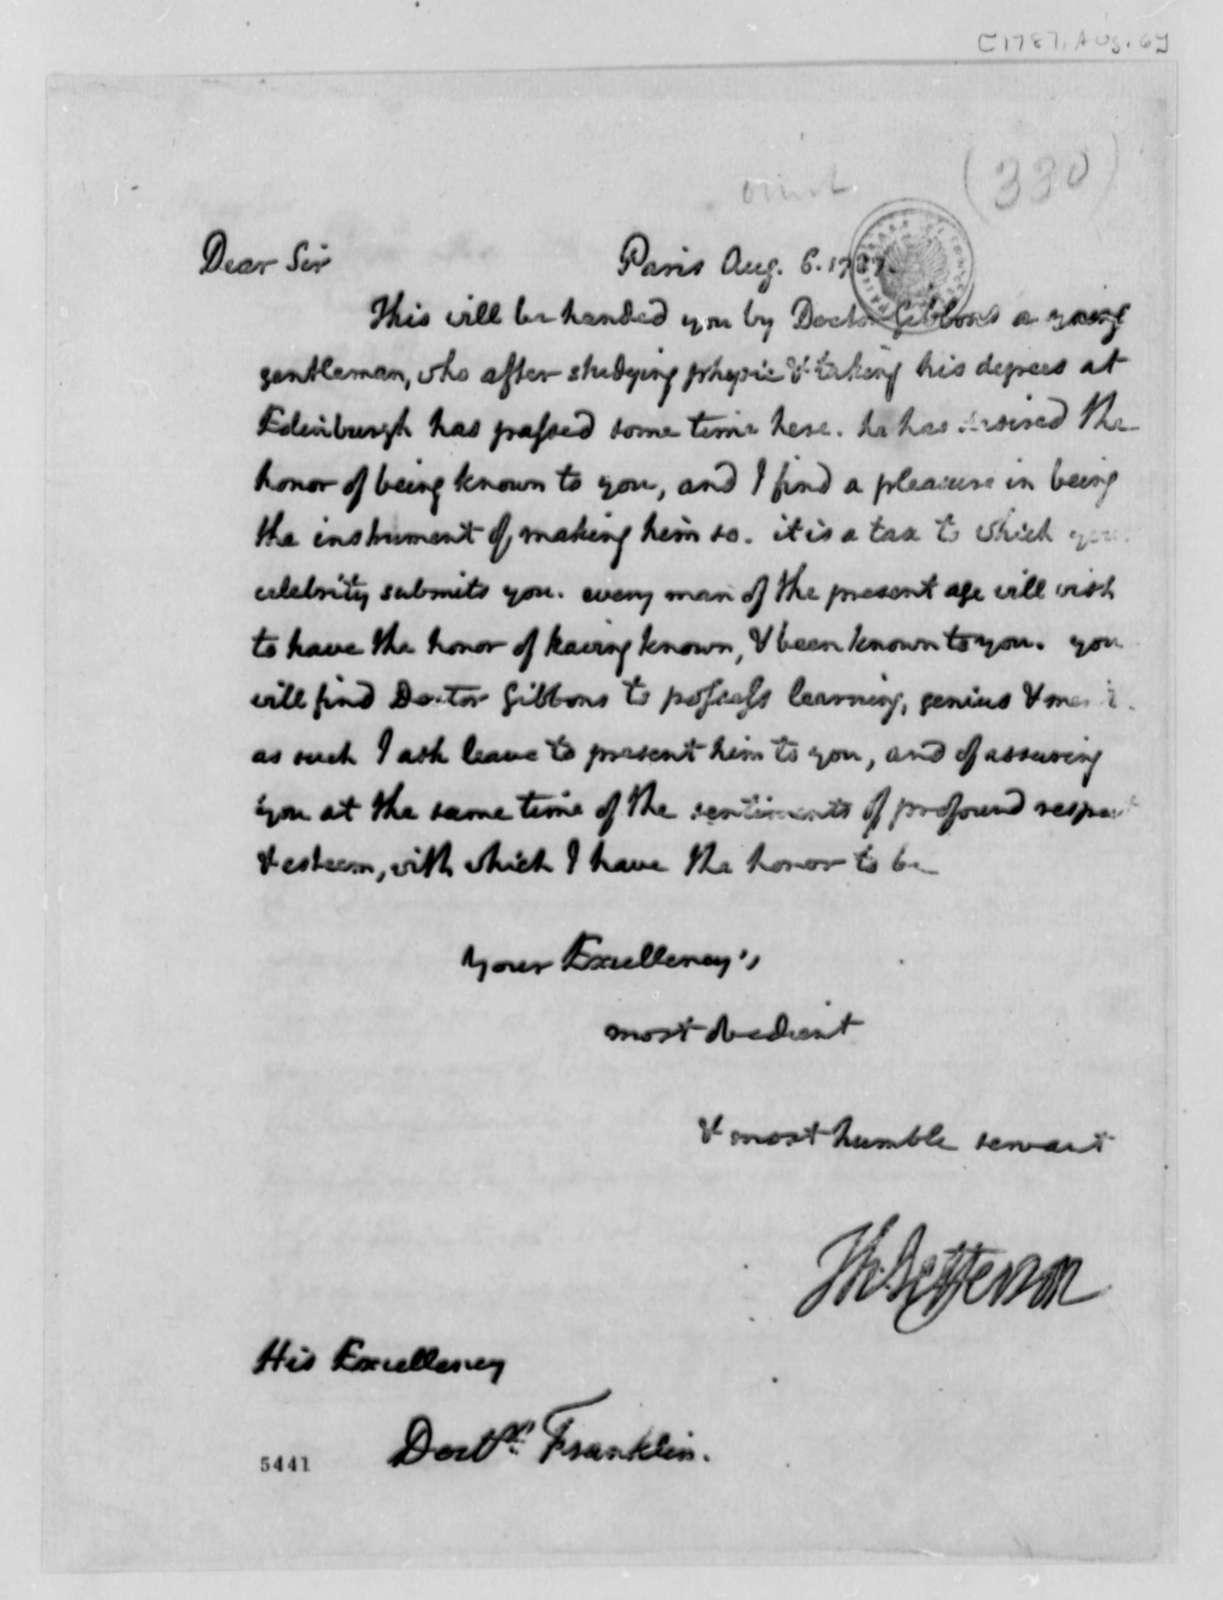 Thomas Jefferson to Benjamin Franklin, August 6, 1787